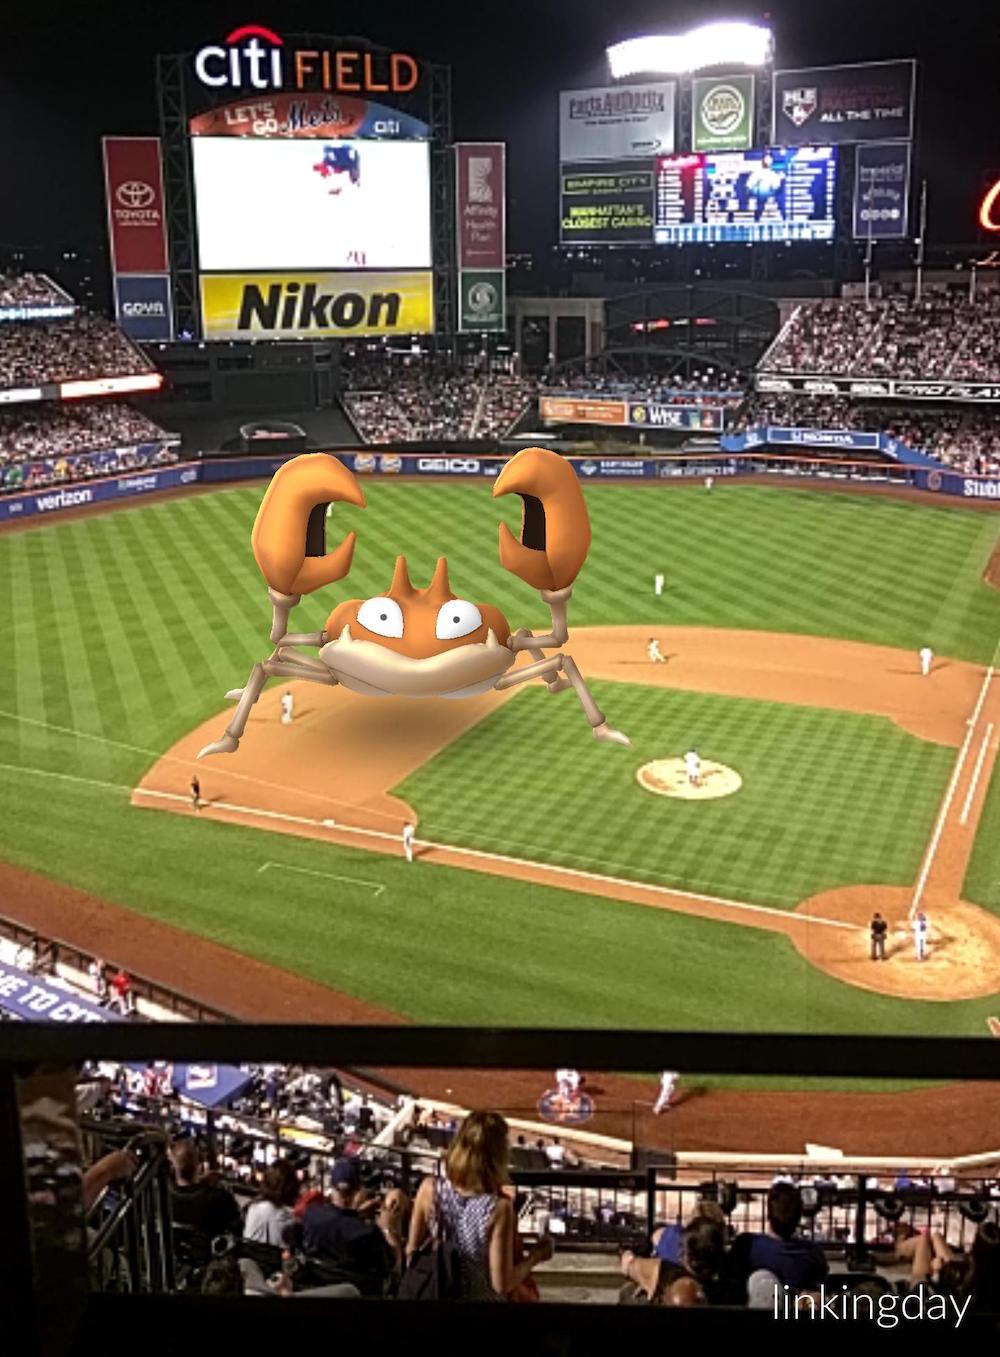 Pokemon GO on a baseball field